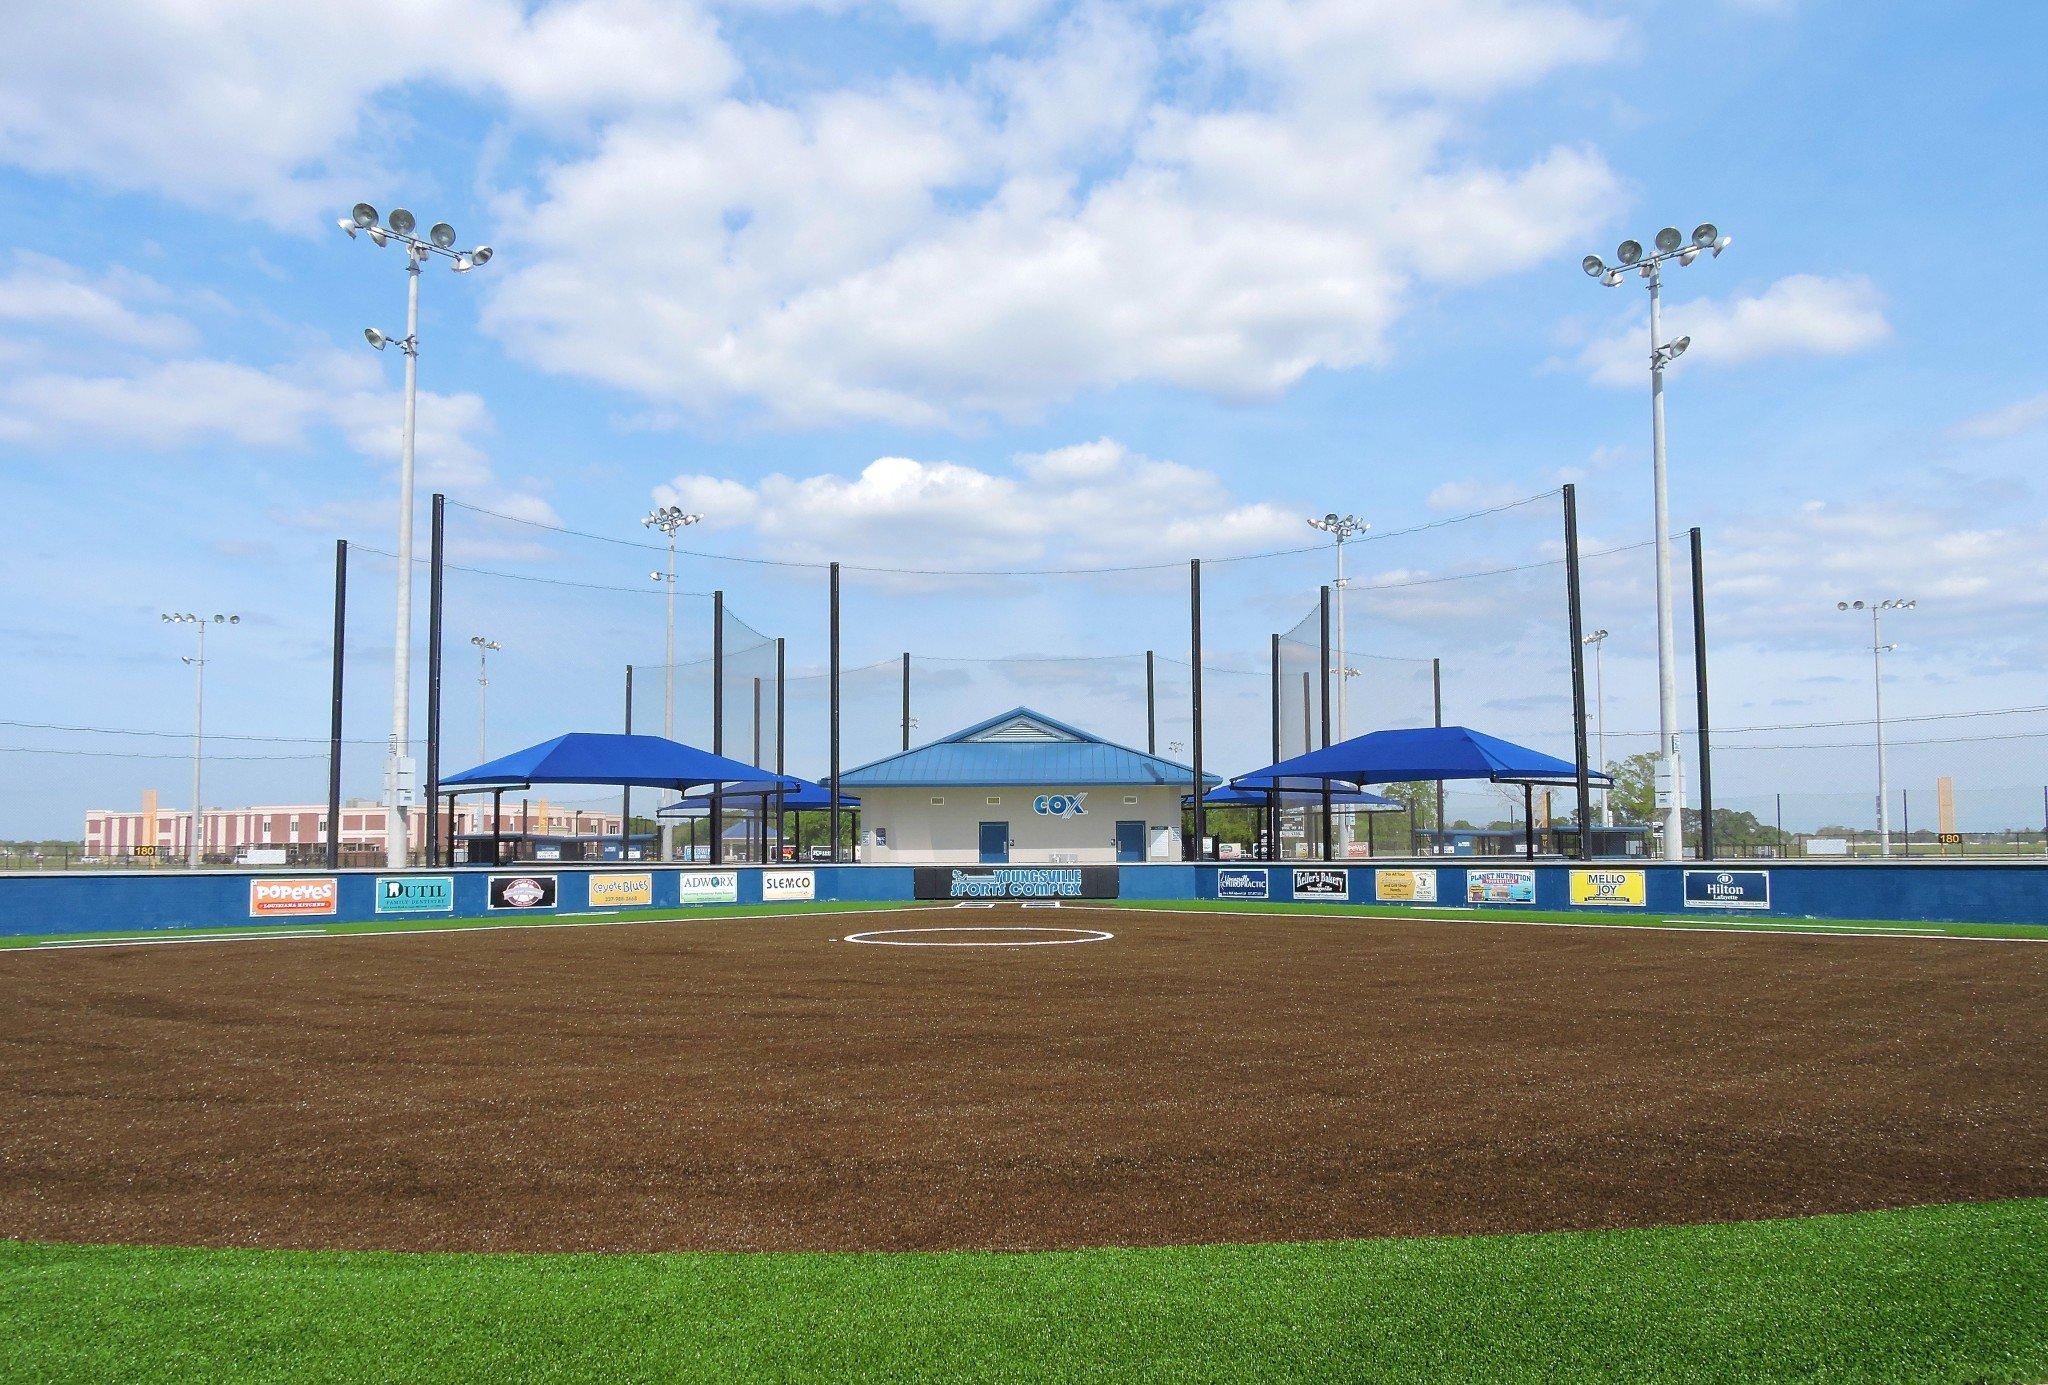 Softball Fields with turf